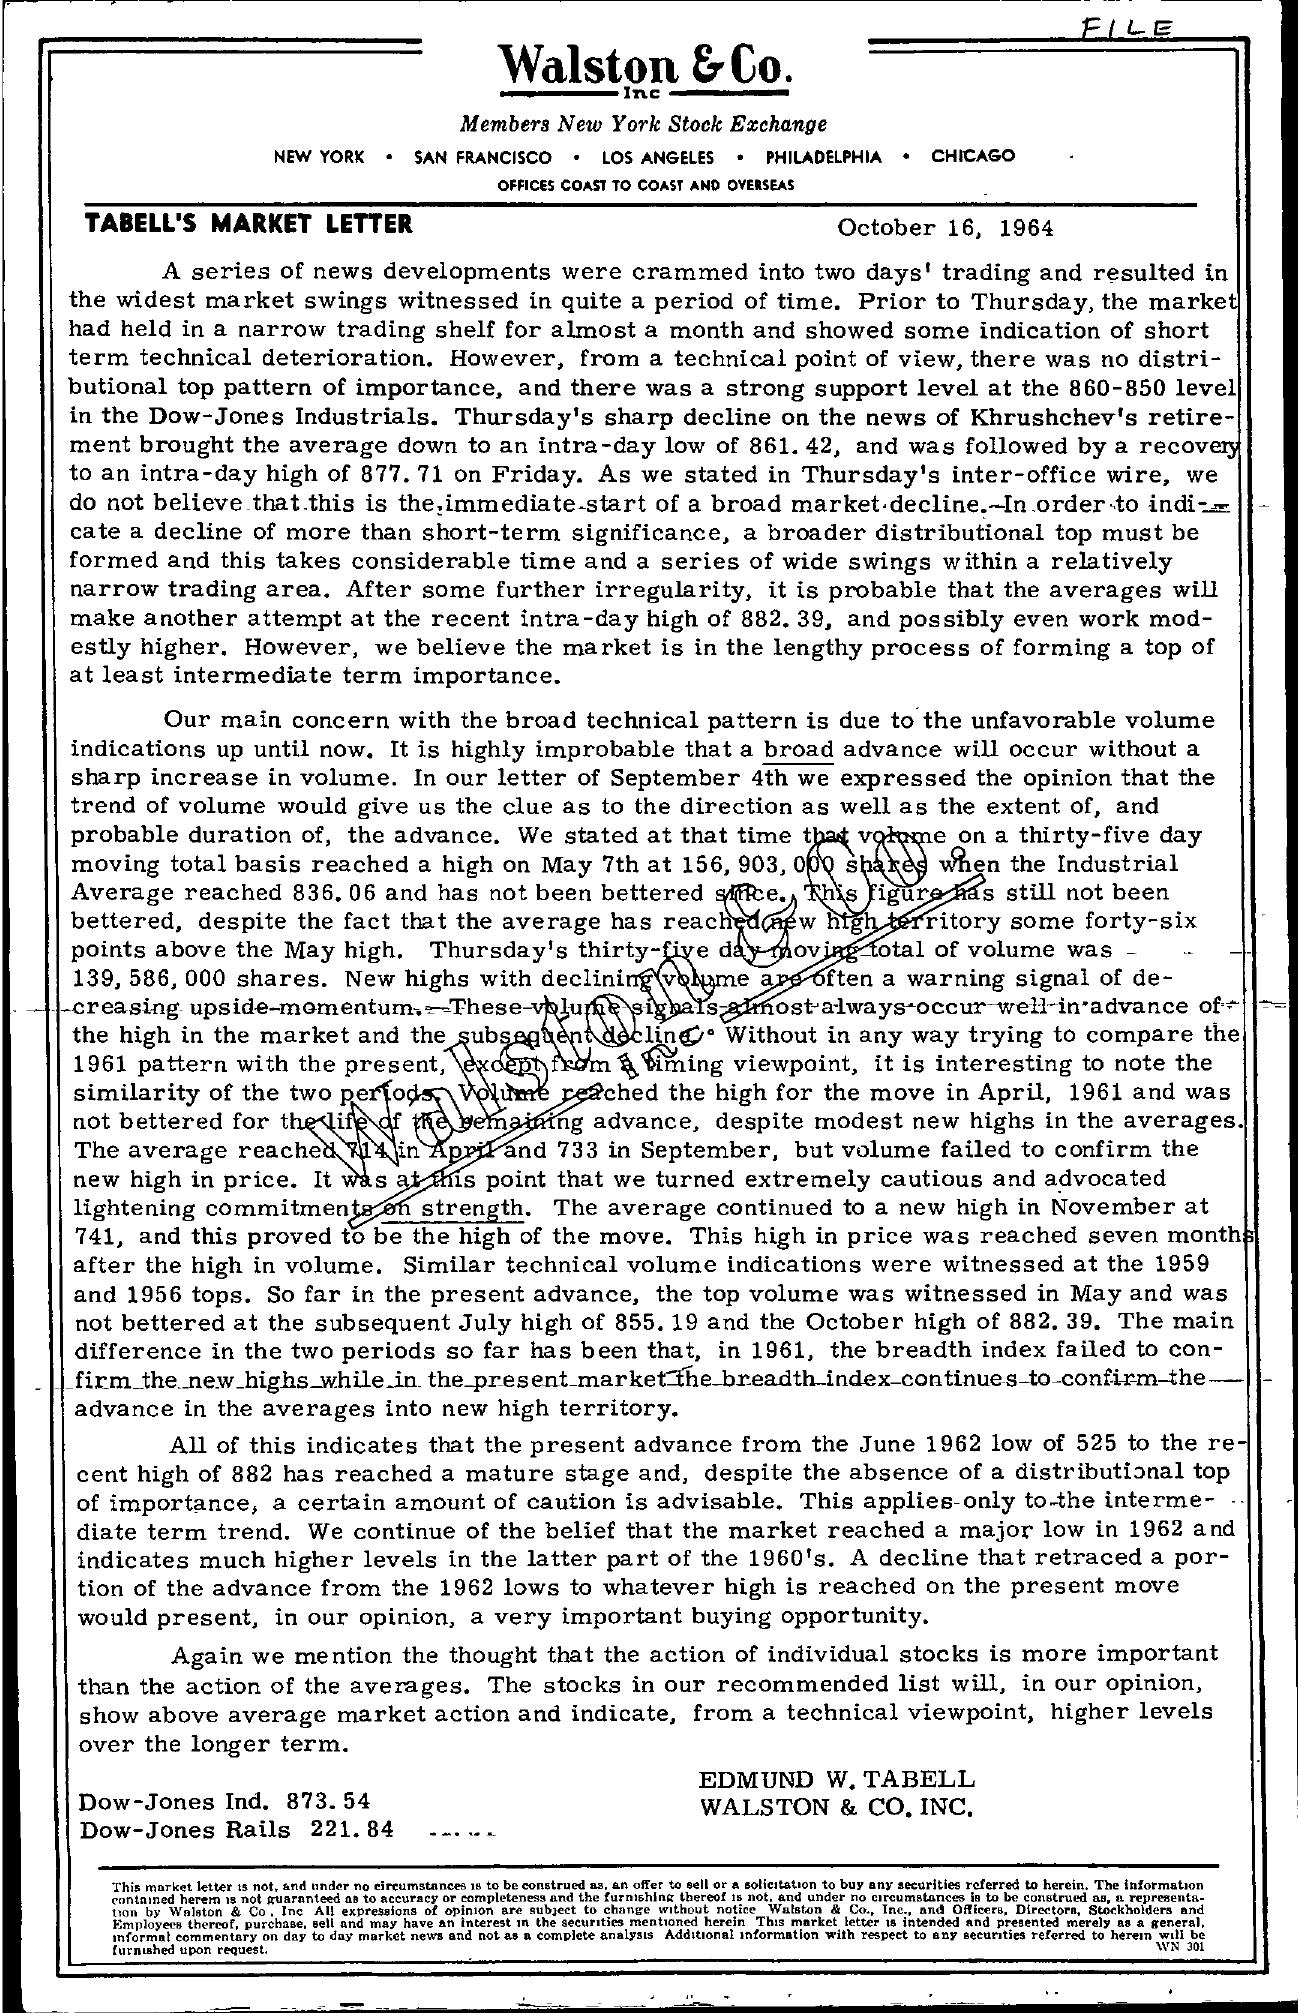 Tabell's Market Letter - October 16, 1964